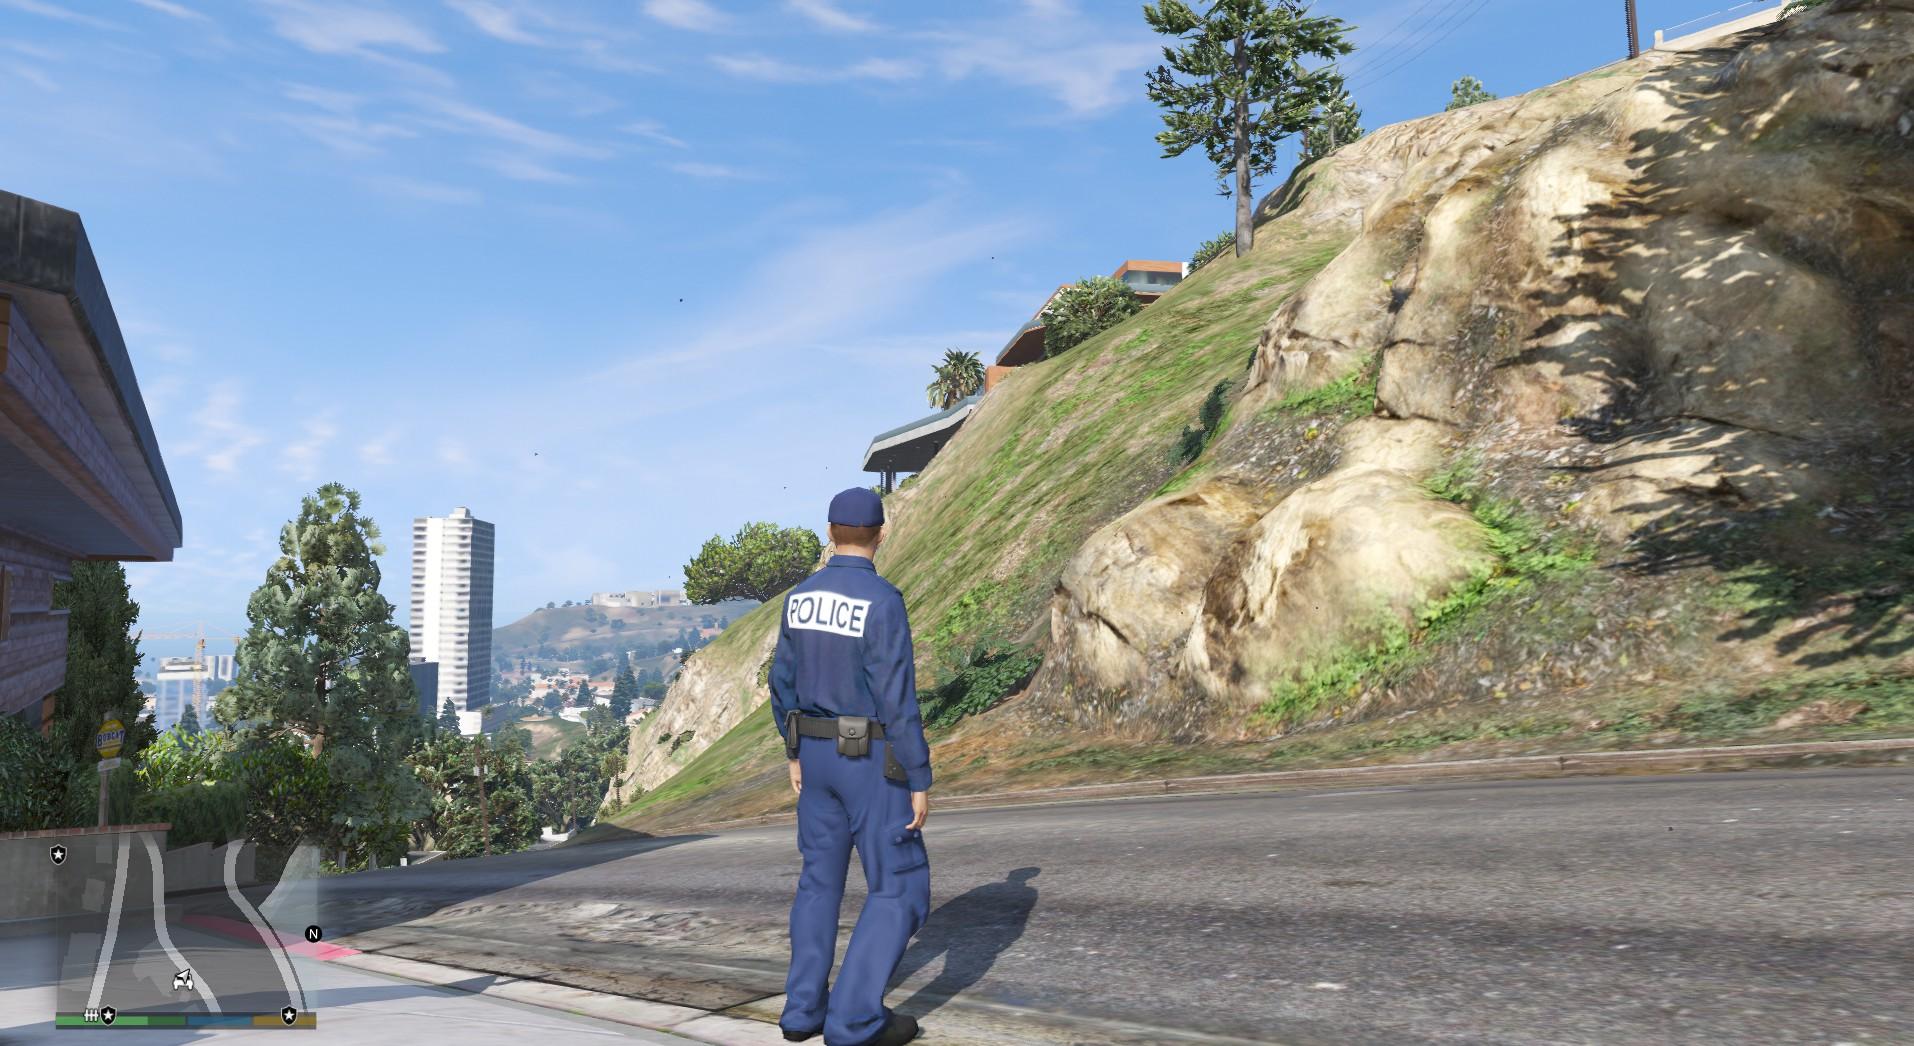 ... Police Municipal Police 3.0 - Personnages pour GTA V sur GTA Modding